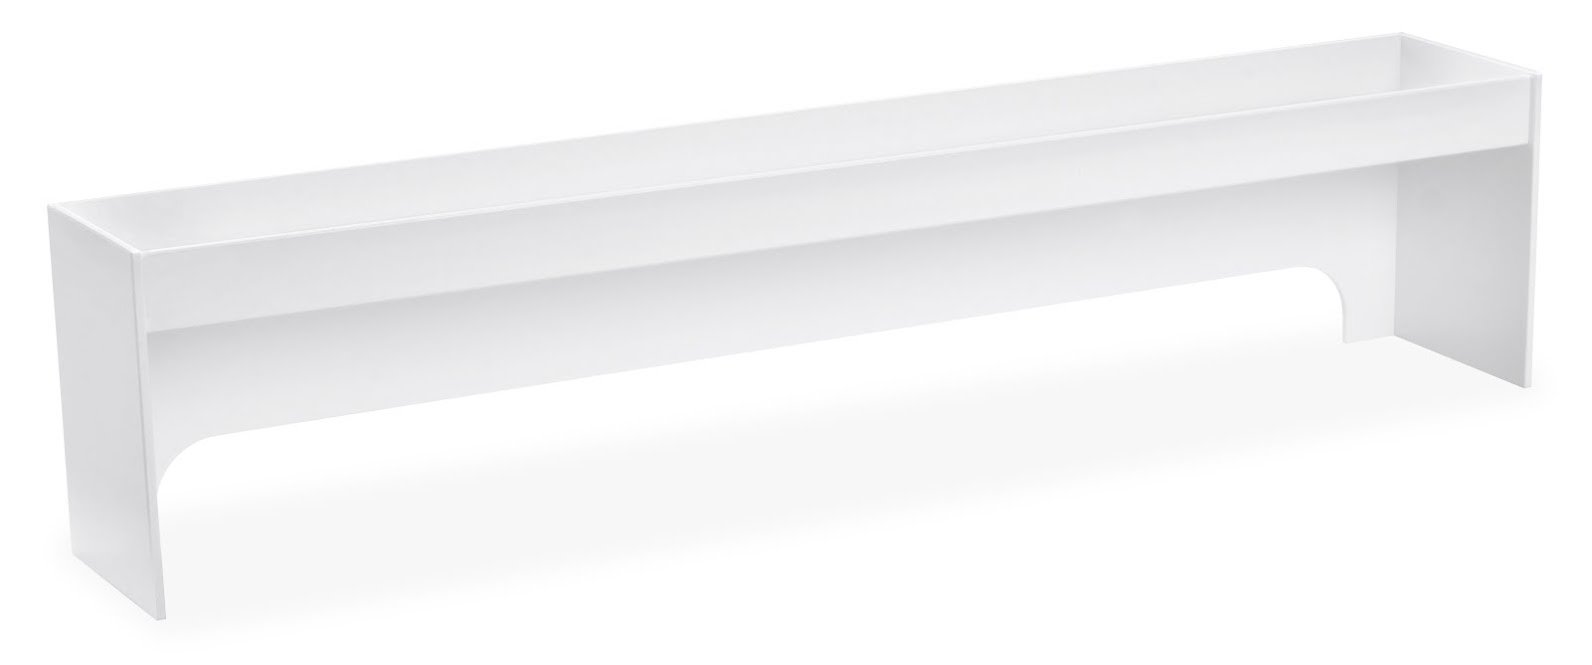 TrippNT 50215 PVC Fume Hood Shelf, 36'' Width x 8'' Height x 5'' Depth, 3 ', White